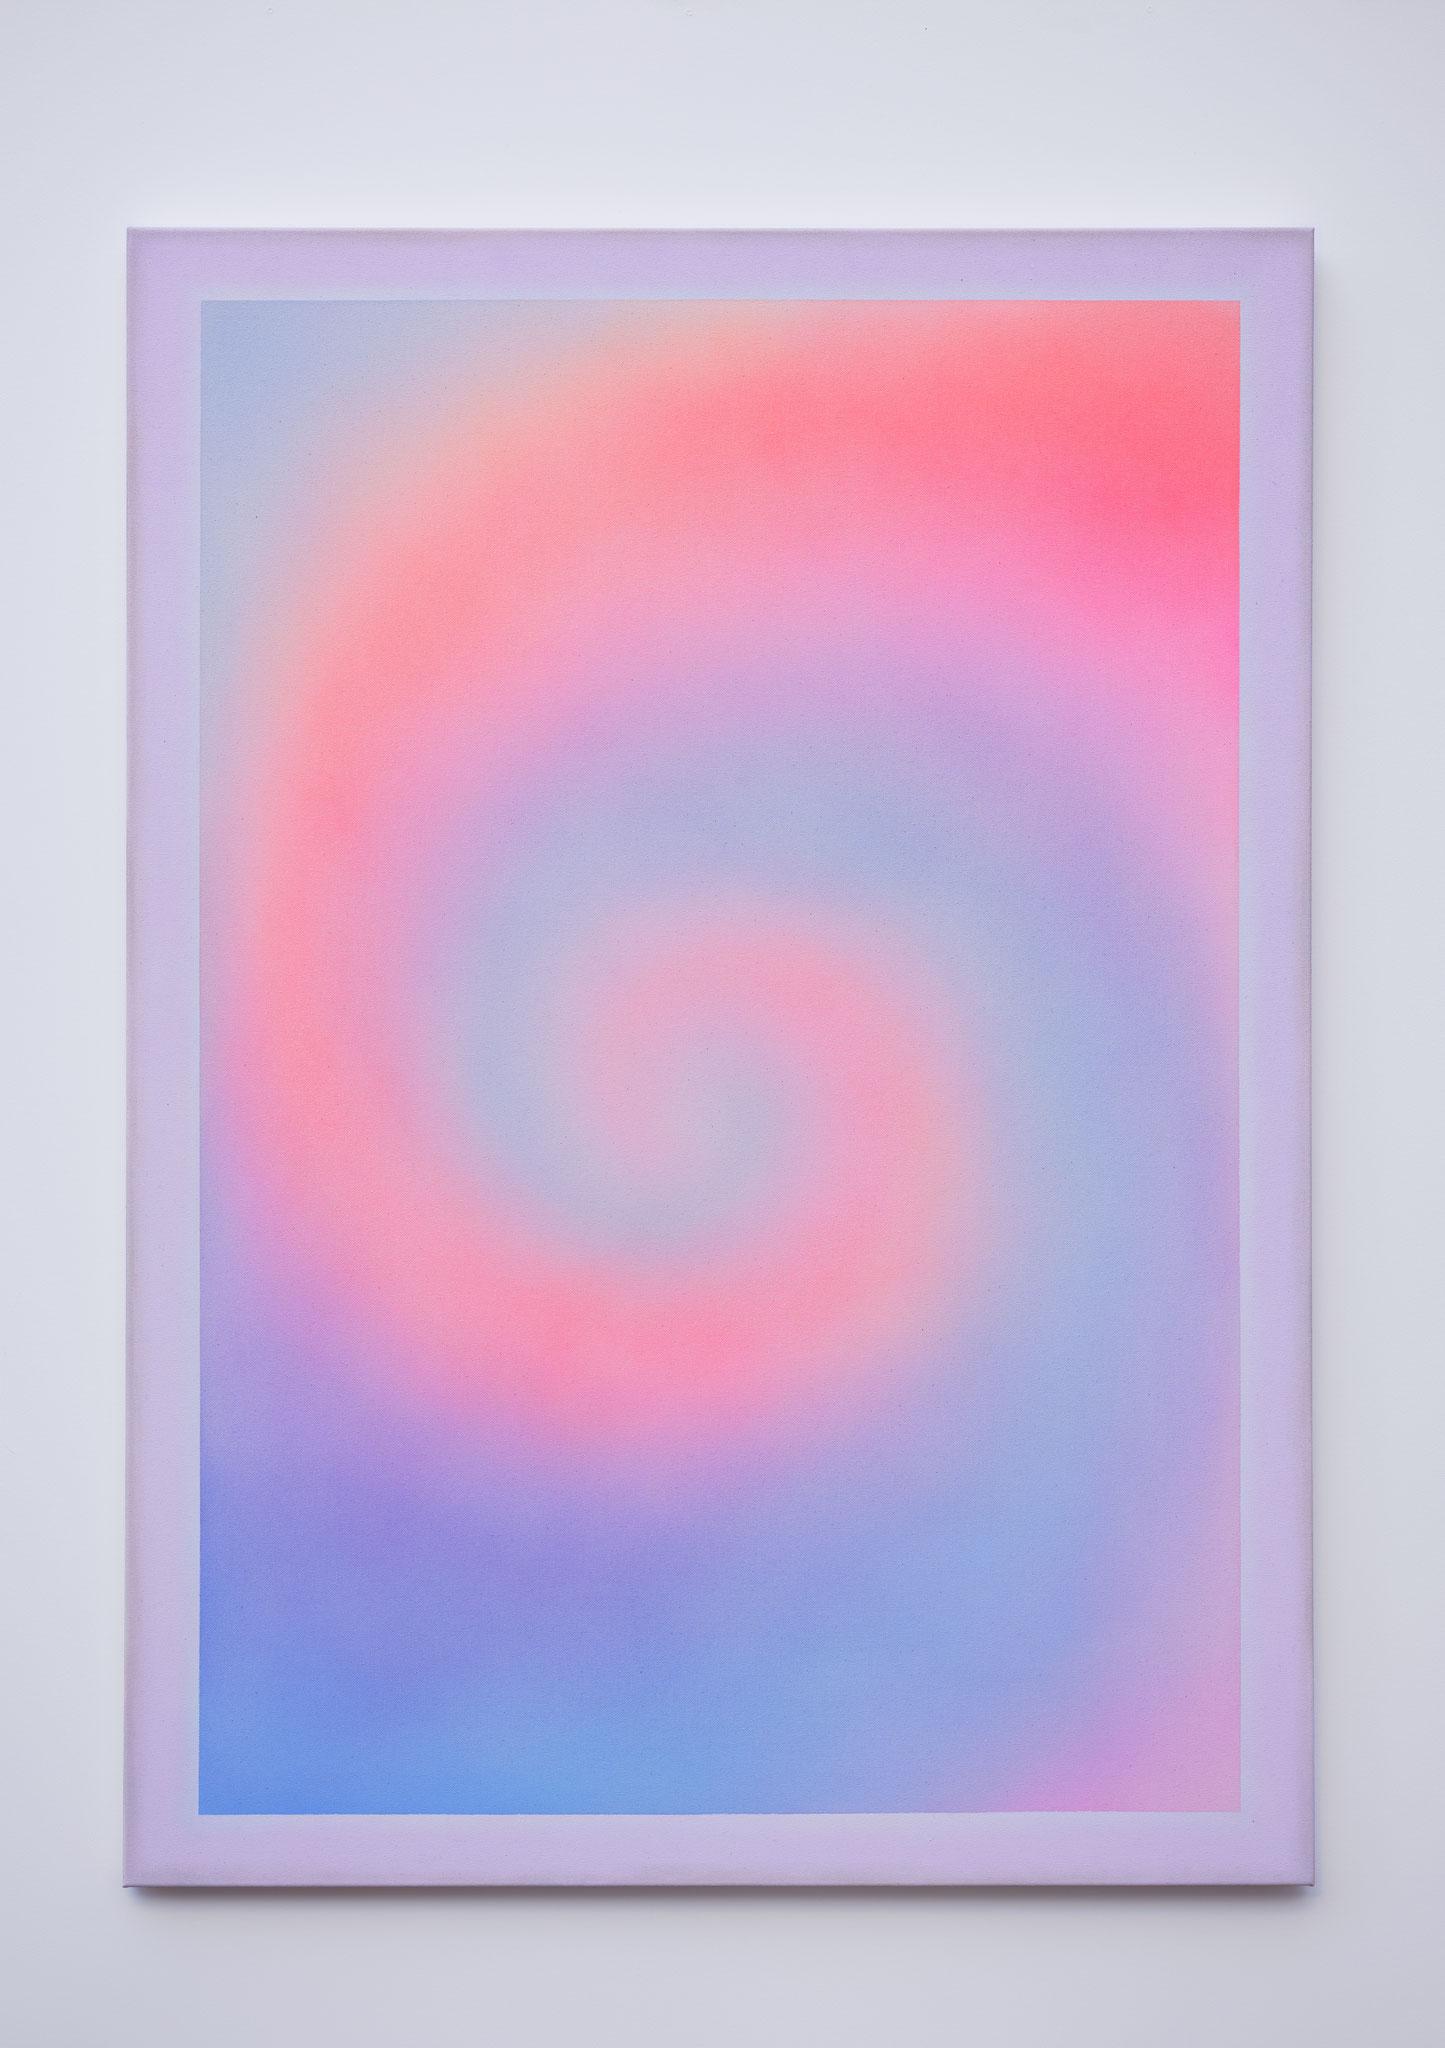 "Alina Birkner ""Untitled (We meet again)"" 2018, 170x120 cm, Acrylic on Canvas"